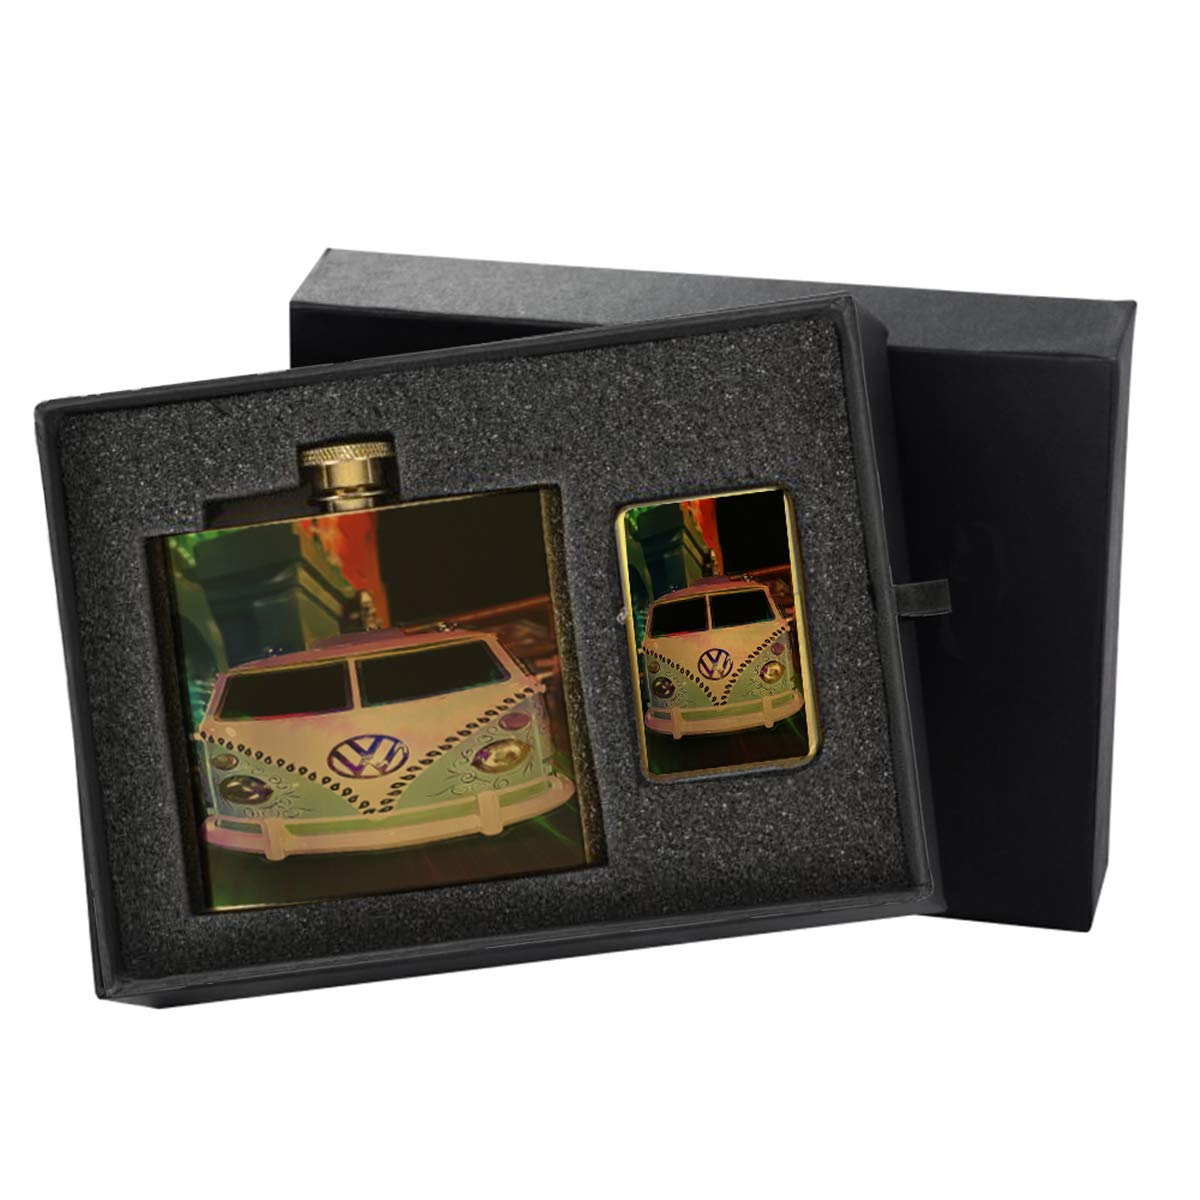 Volkswagon Van Art - Gold Lighter and Pocket Hip Liquor Flask Survival Camping Gift Box Set